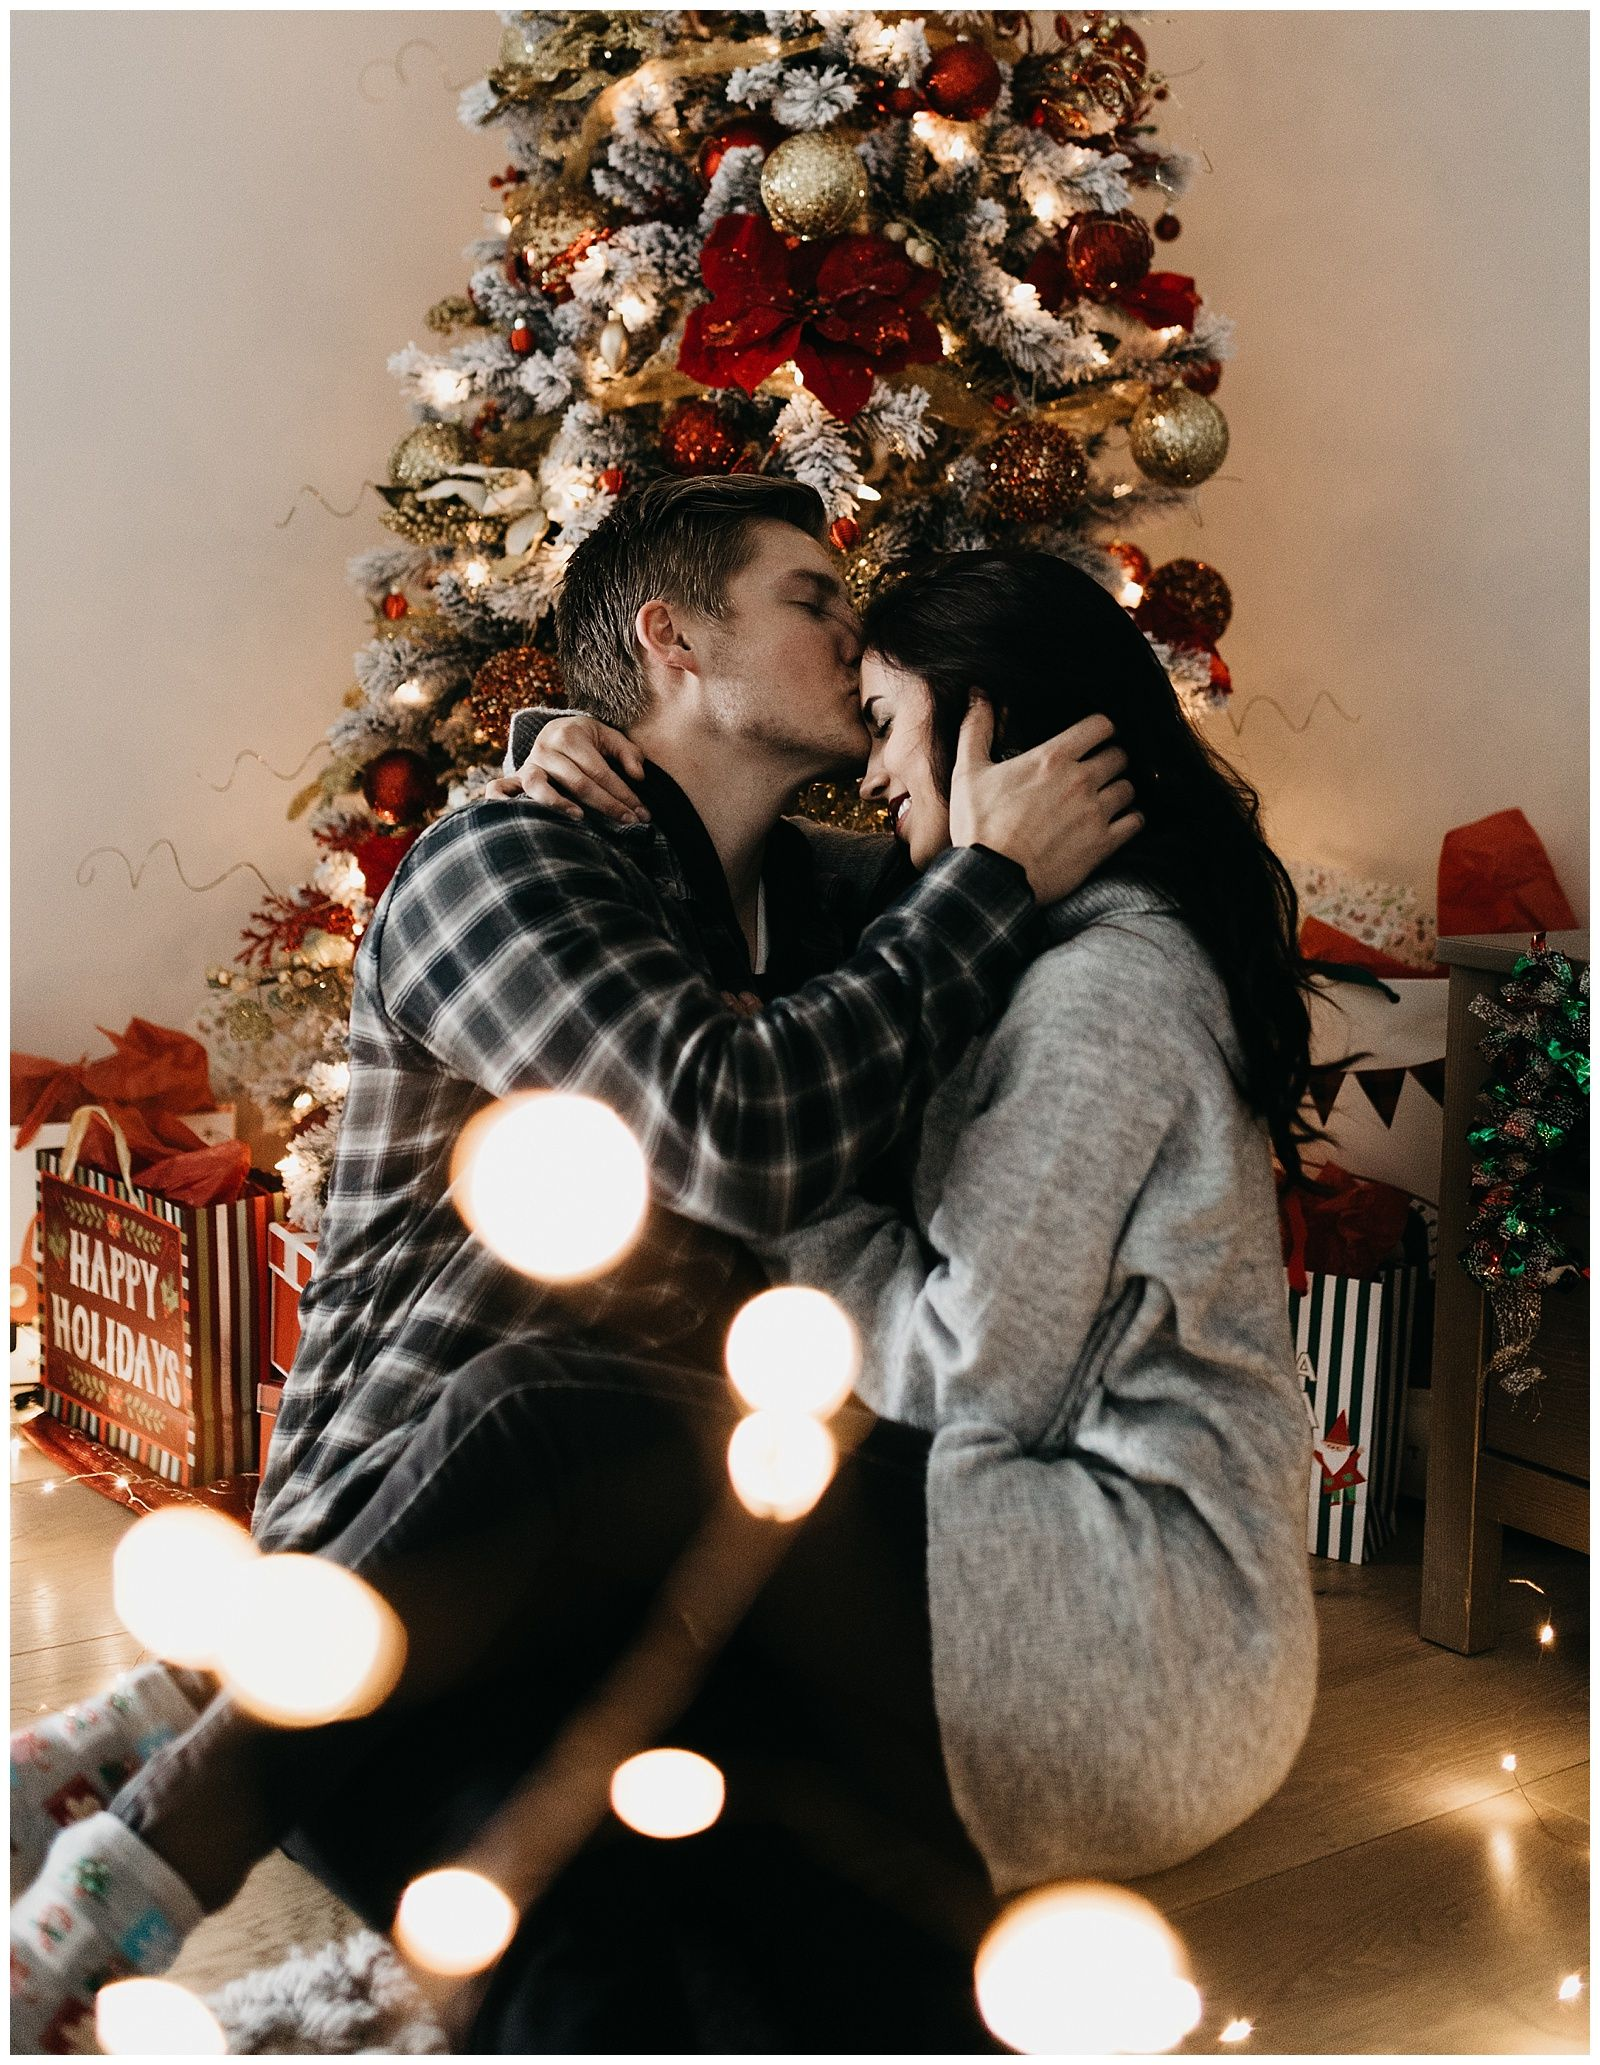 Alayna And Gavin Christmas In Home Session Christmas Couple Pictures Christmas Photography Couples Christmas Photoshoot